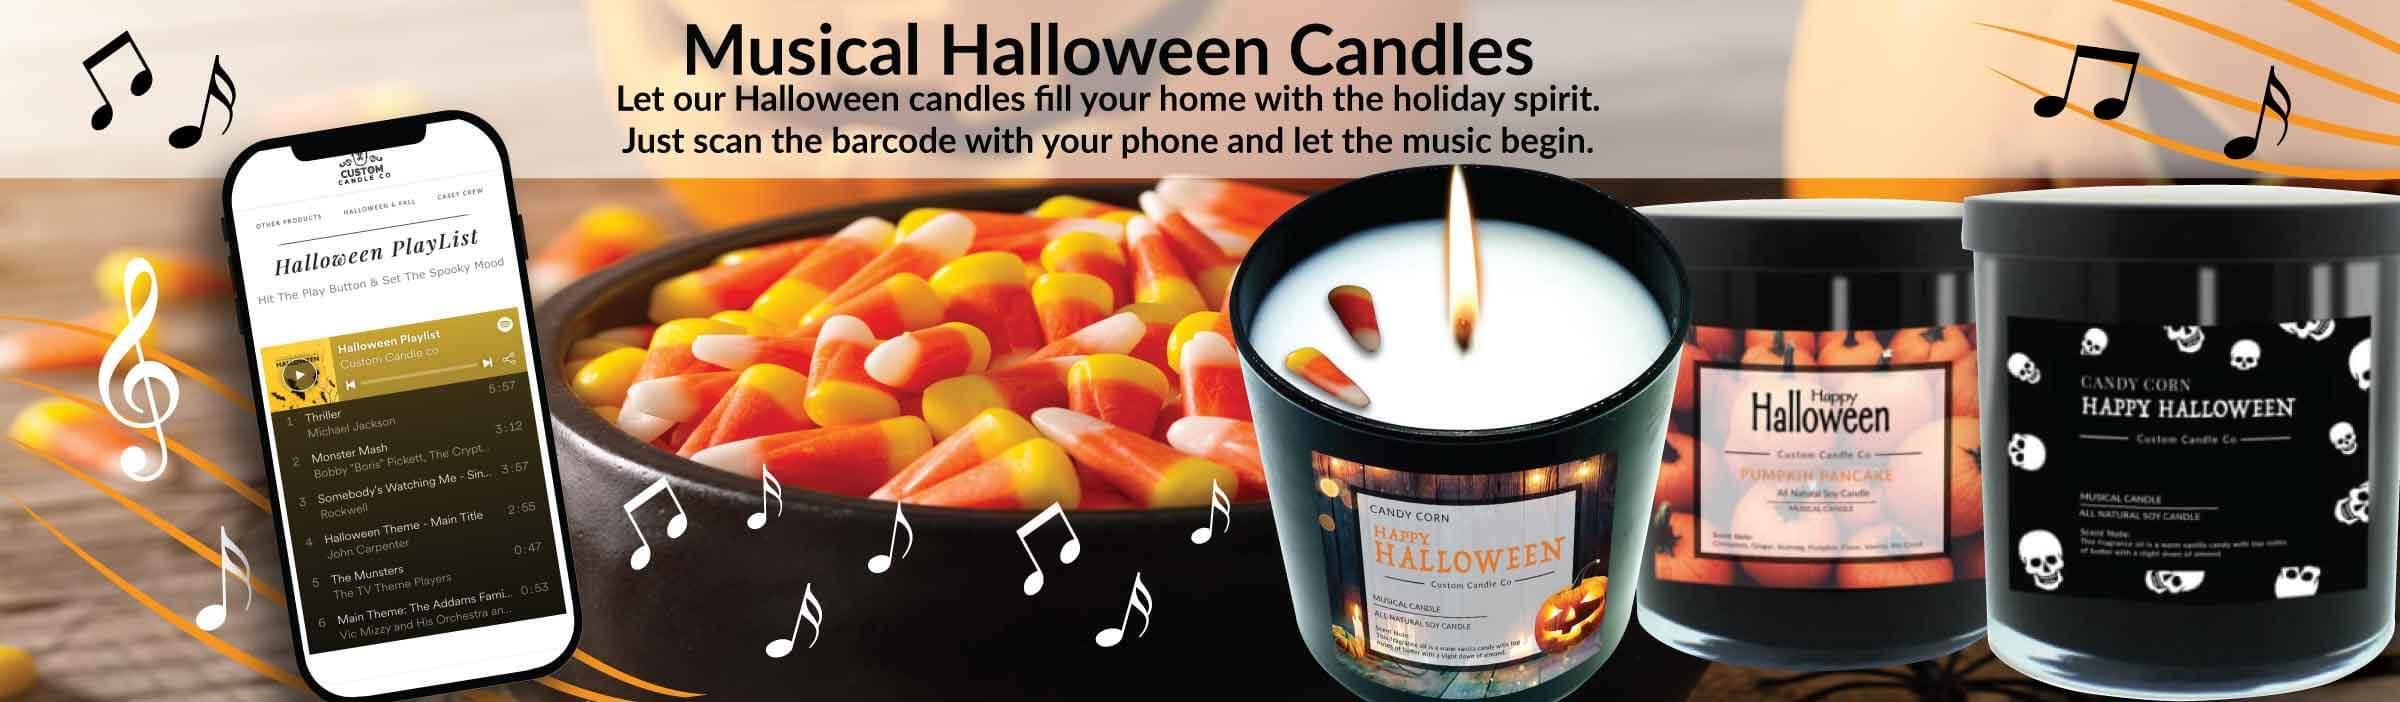 Musical Halloween Candles